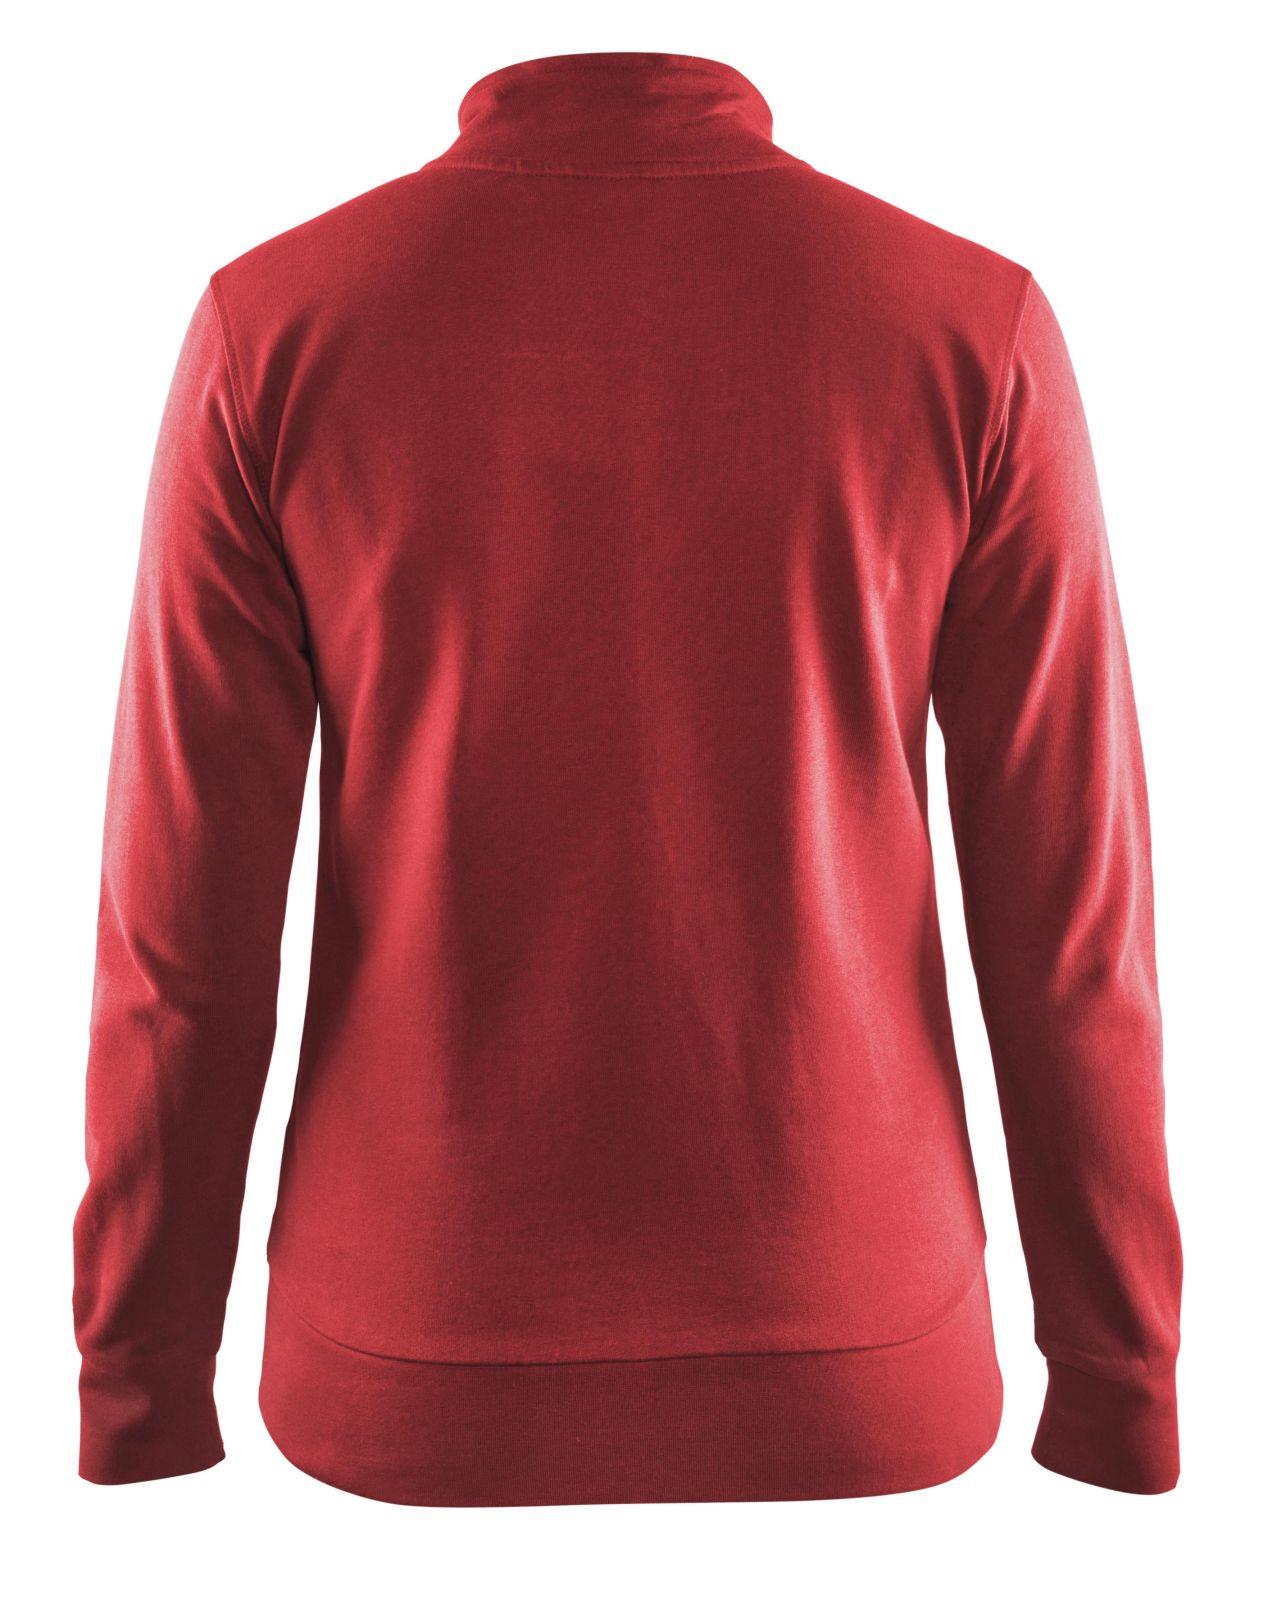 Blaklader Dames sweatvesten 33721158 rood(5600)